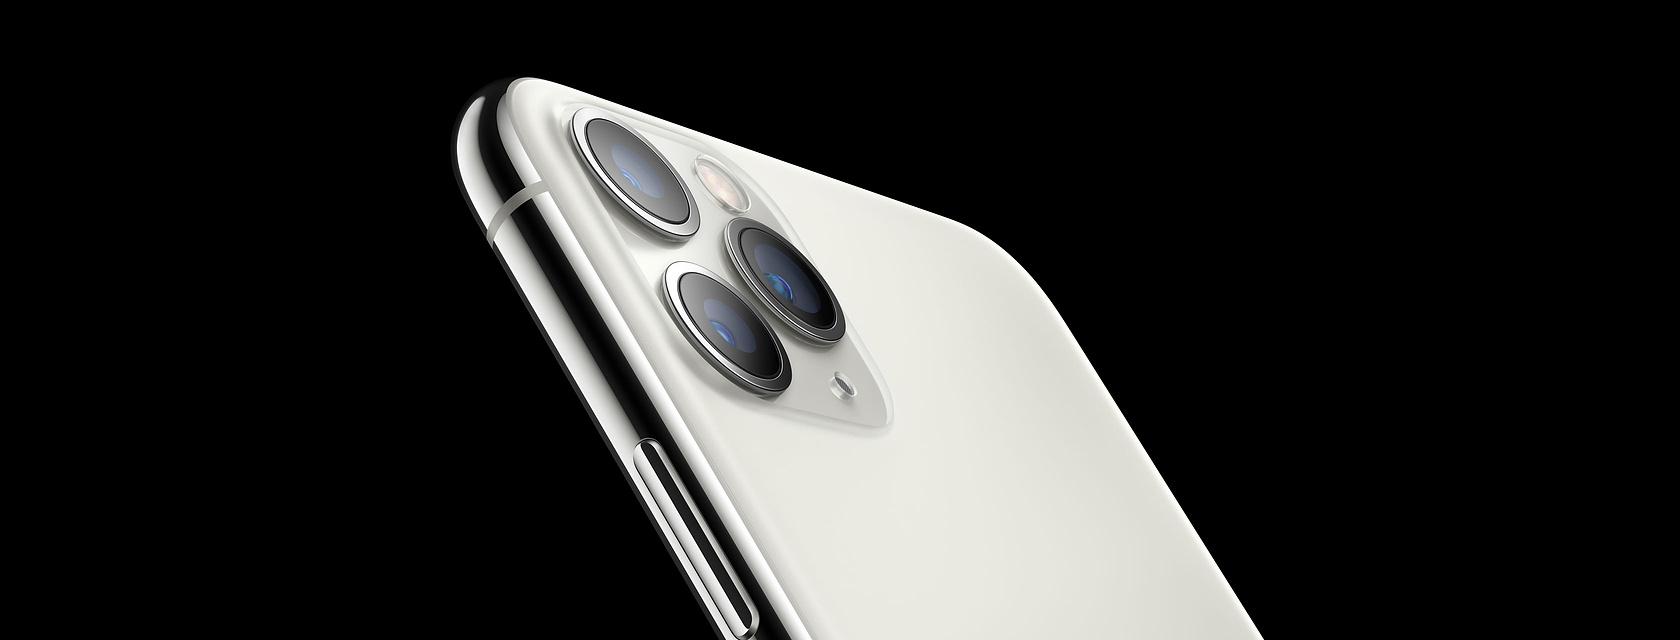 айфон 11 про 256 гб серебристый